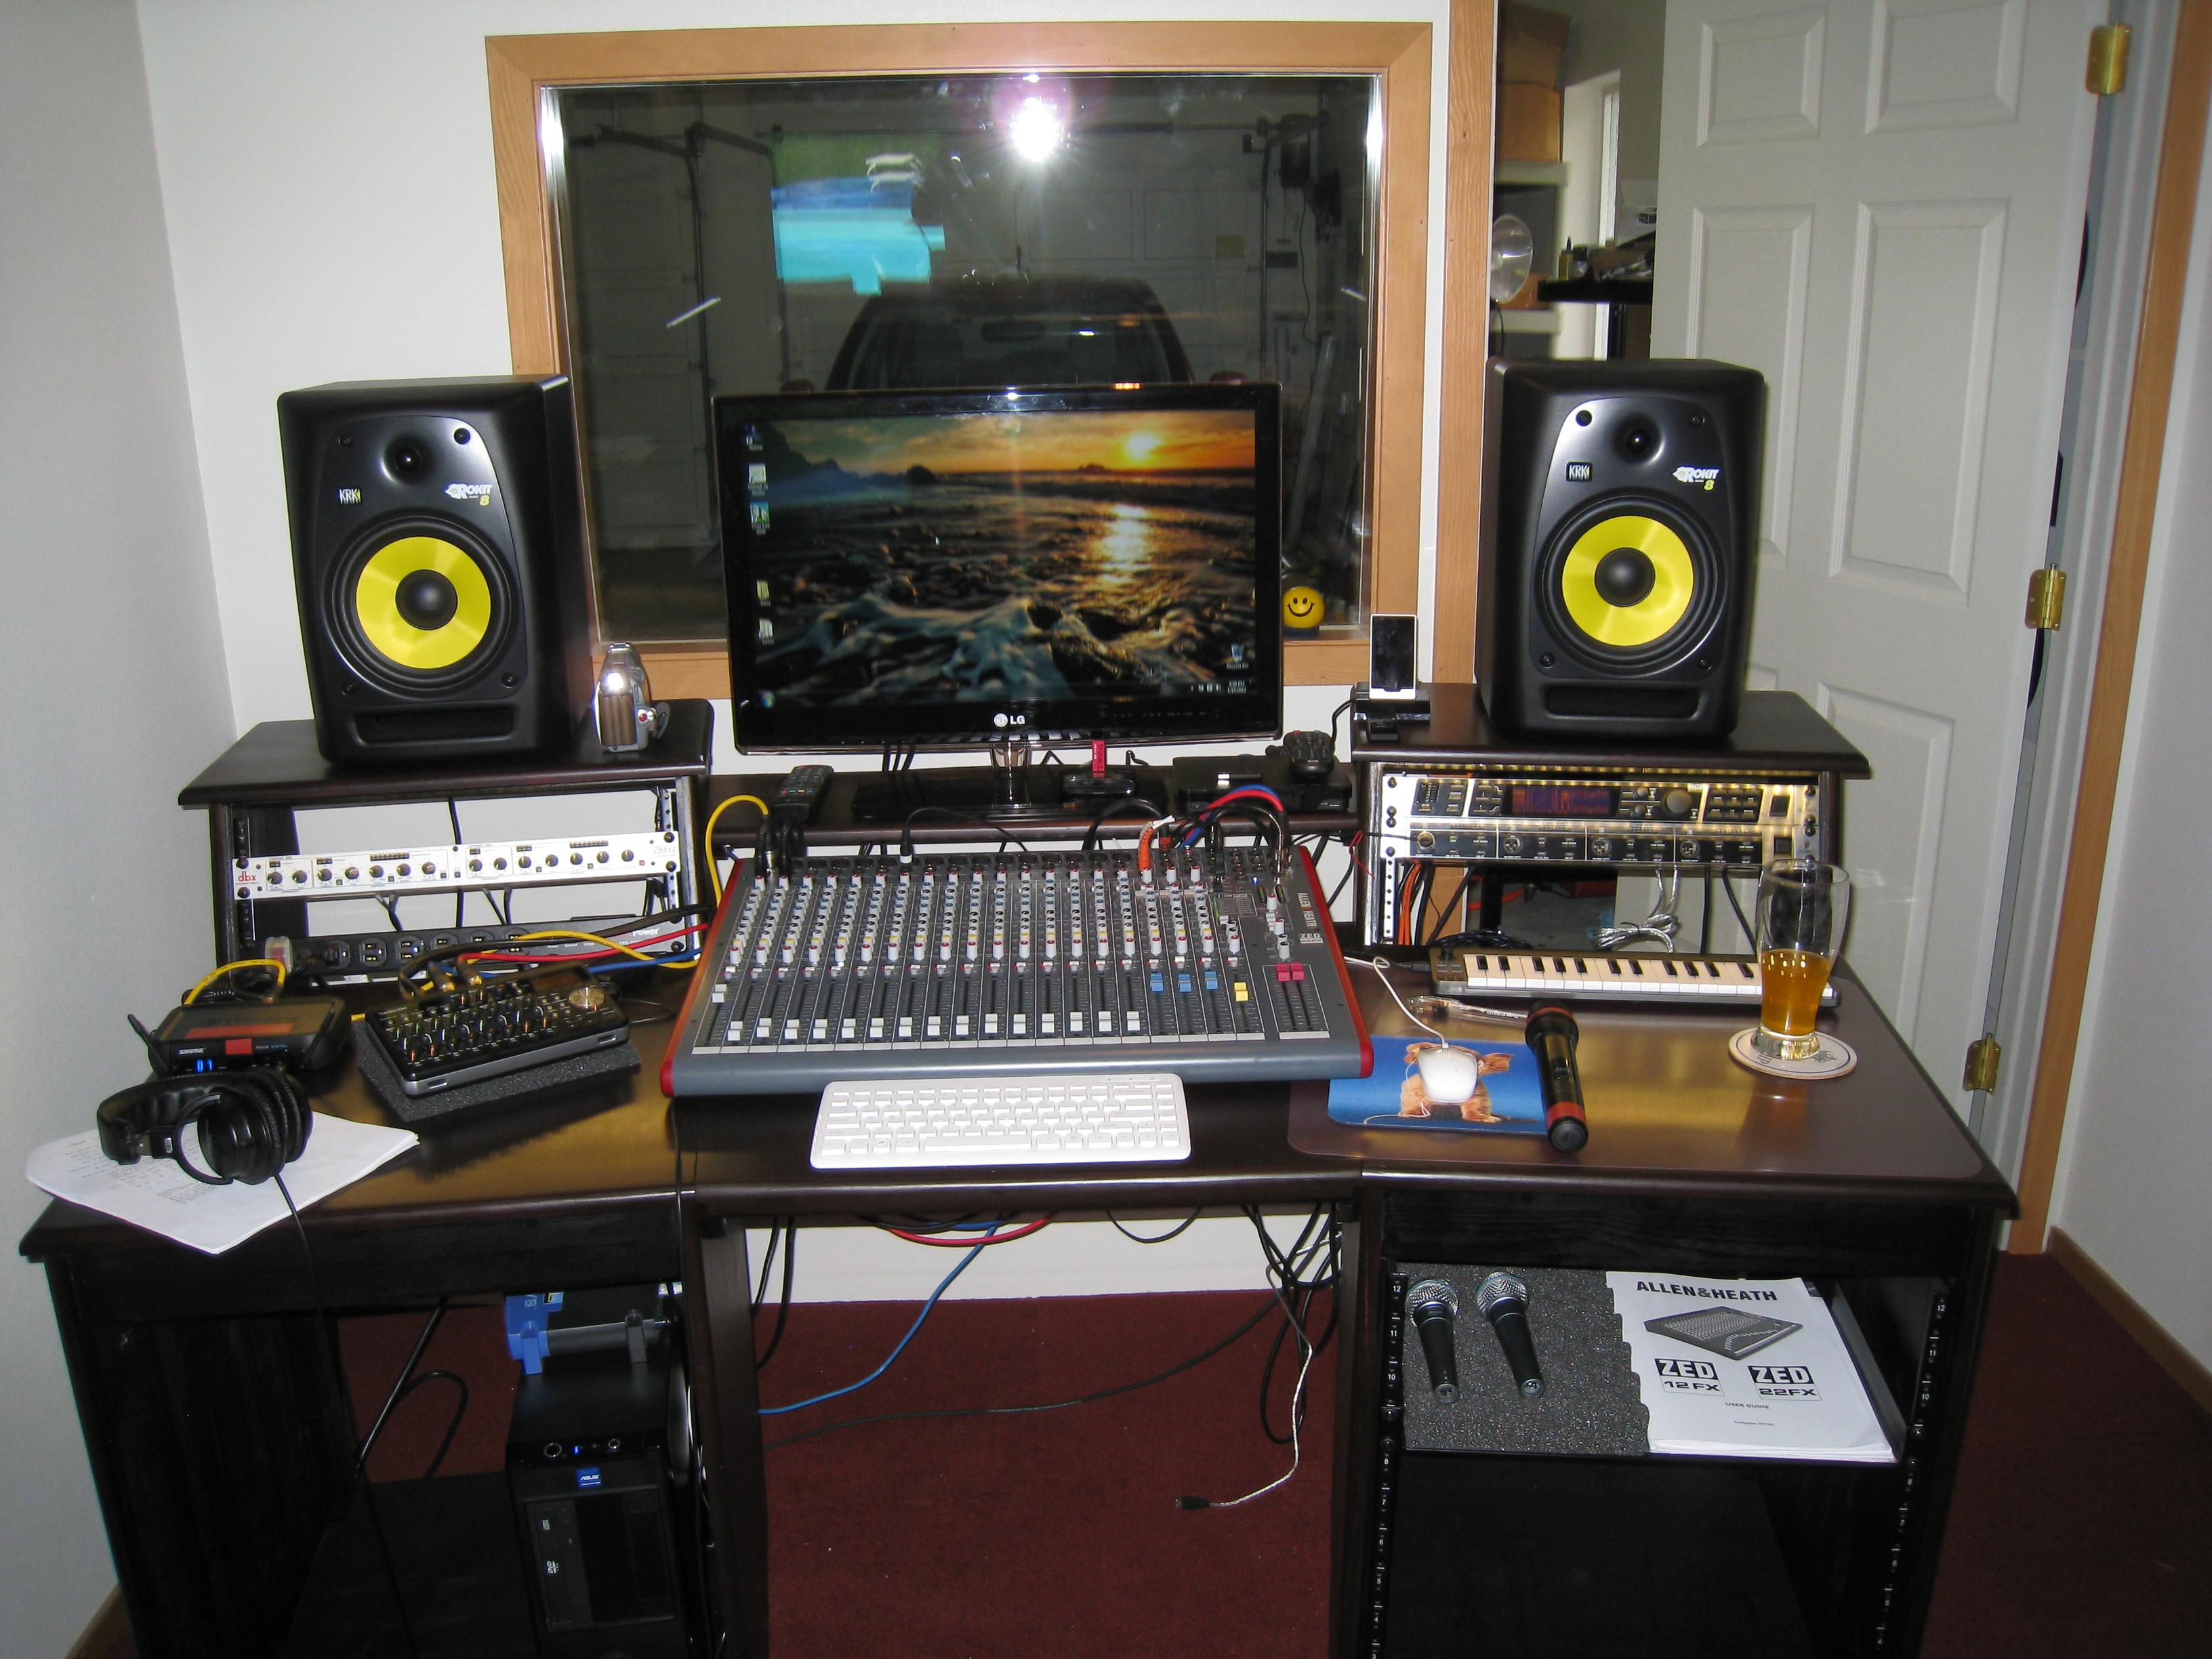 sound construction studio desk clone build page 2 gearslutz pro audio community. Black Bedroom Furniture Sets. Home Design Ideas